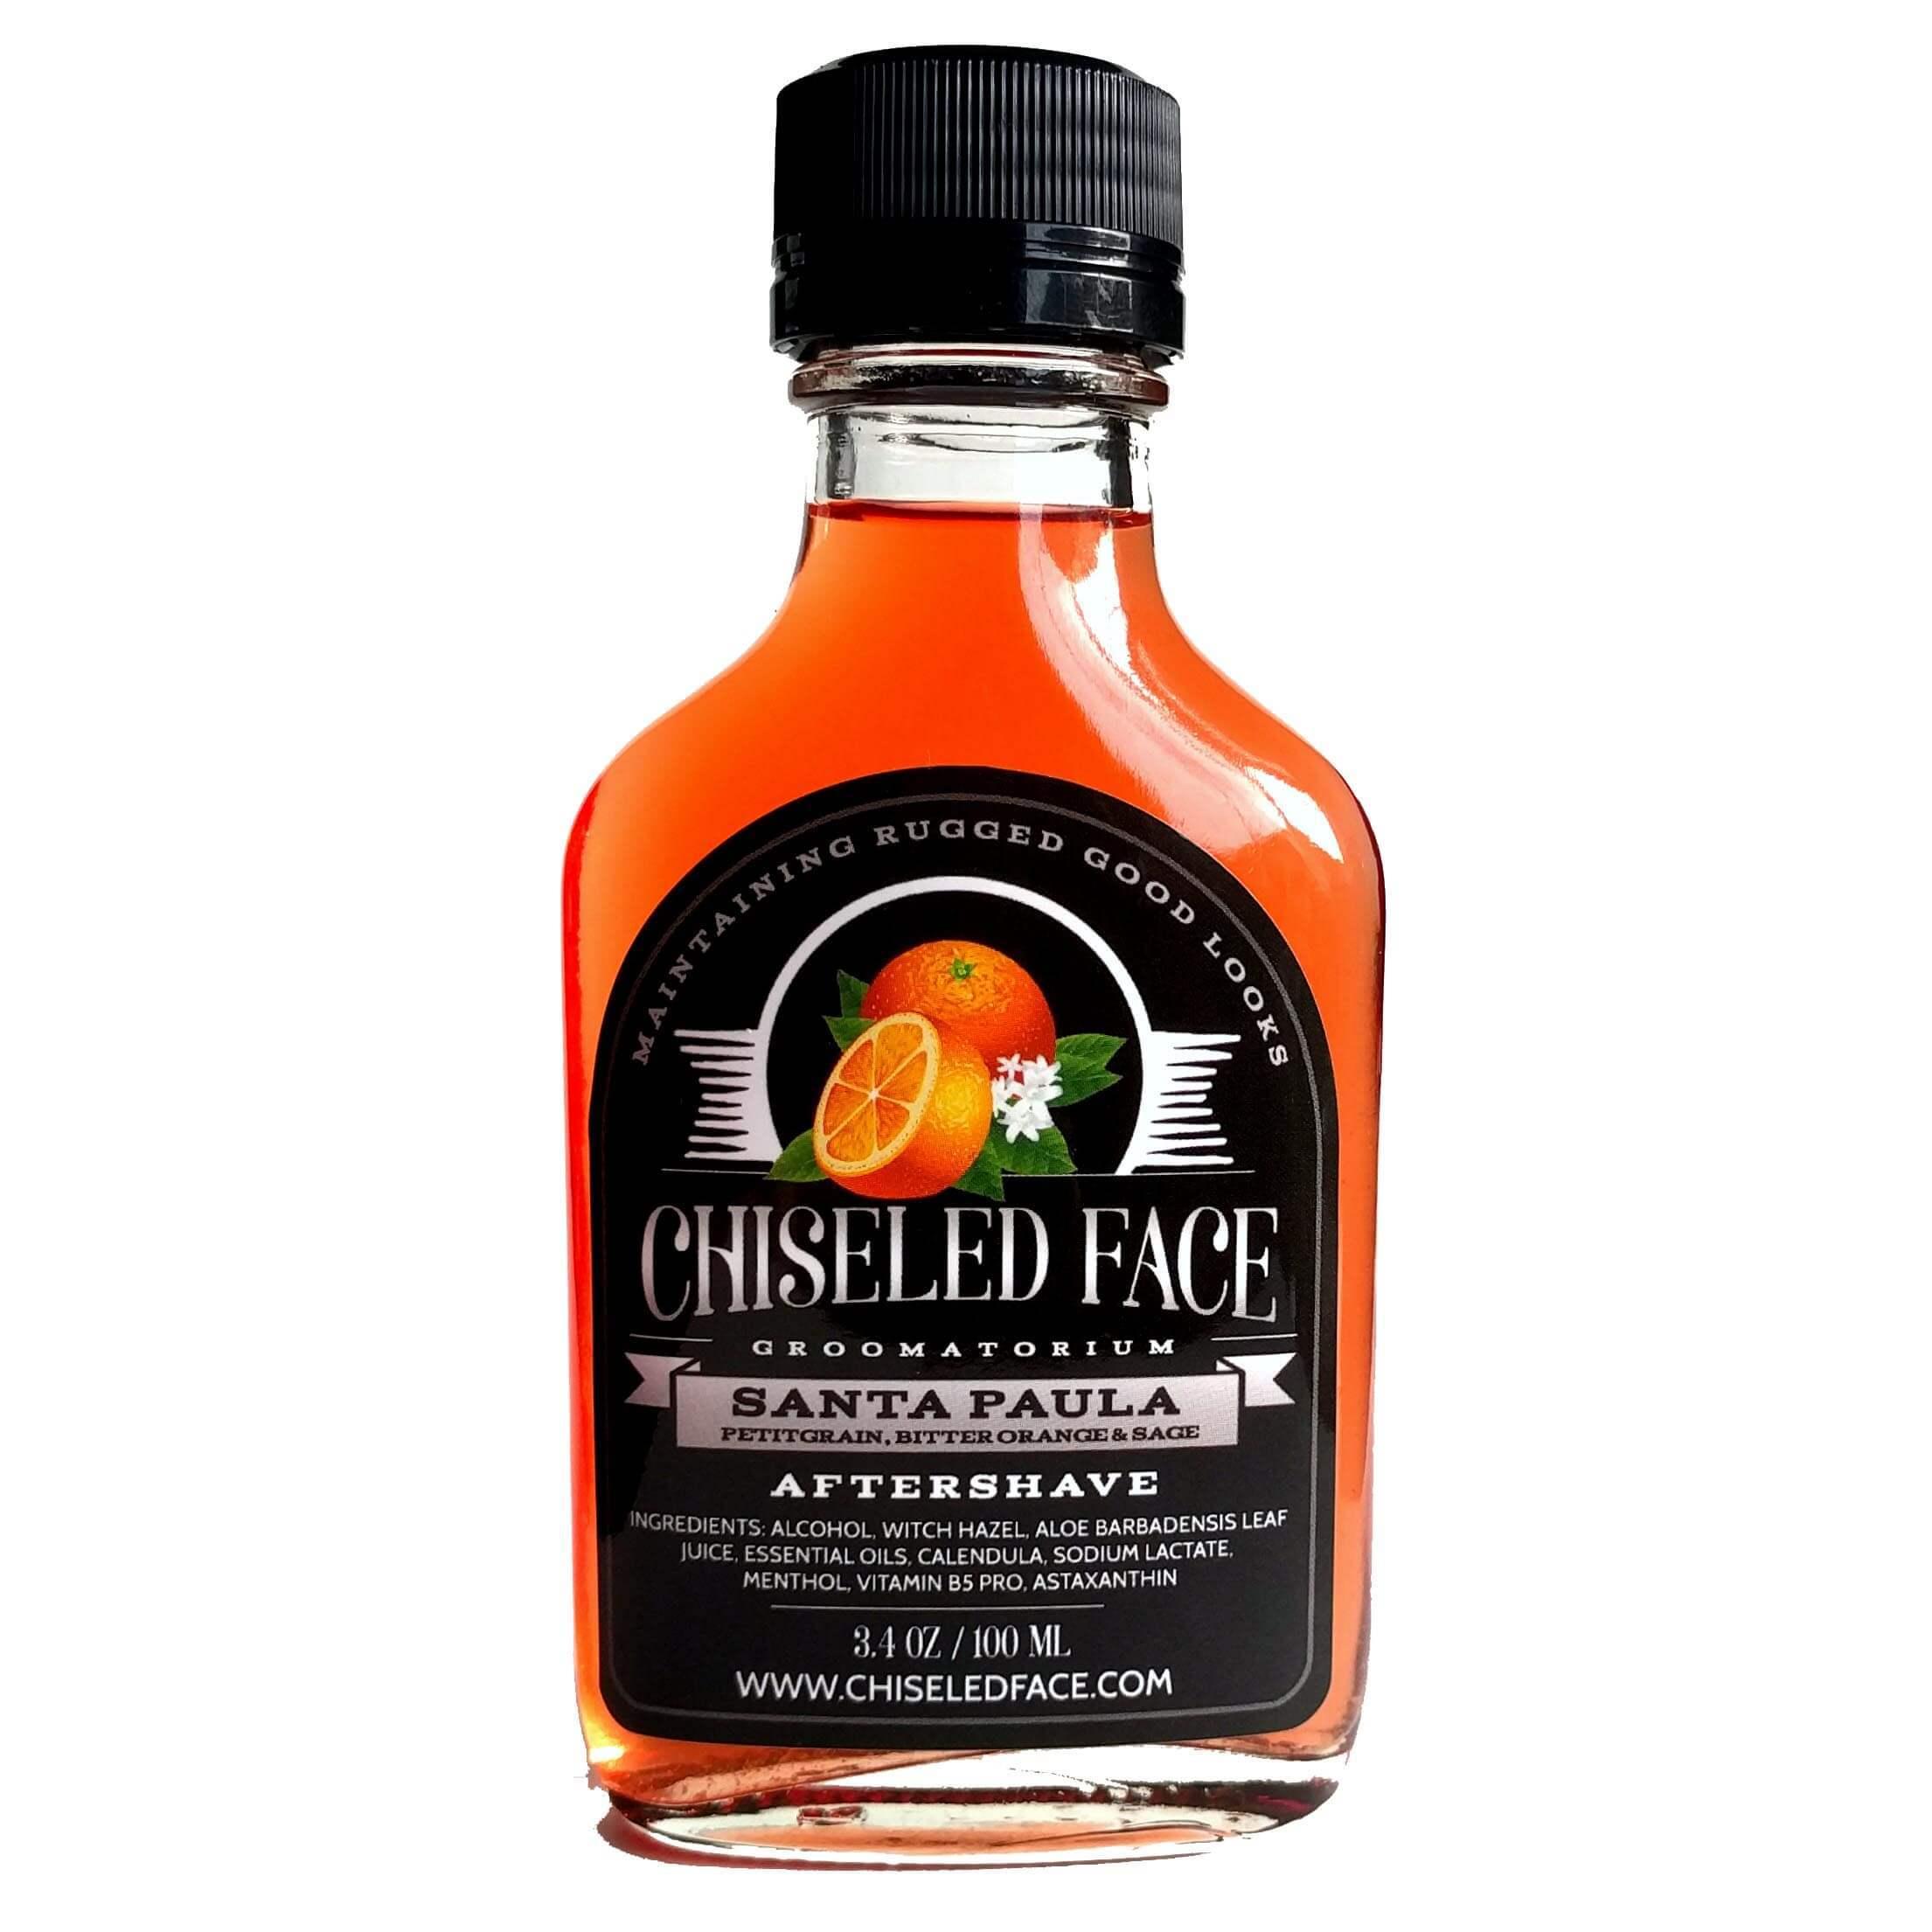 Chiseled Face - Santa Paula - Aftershave image